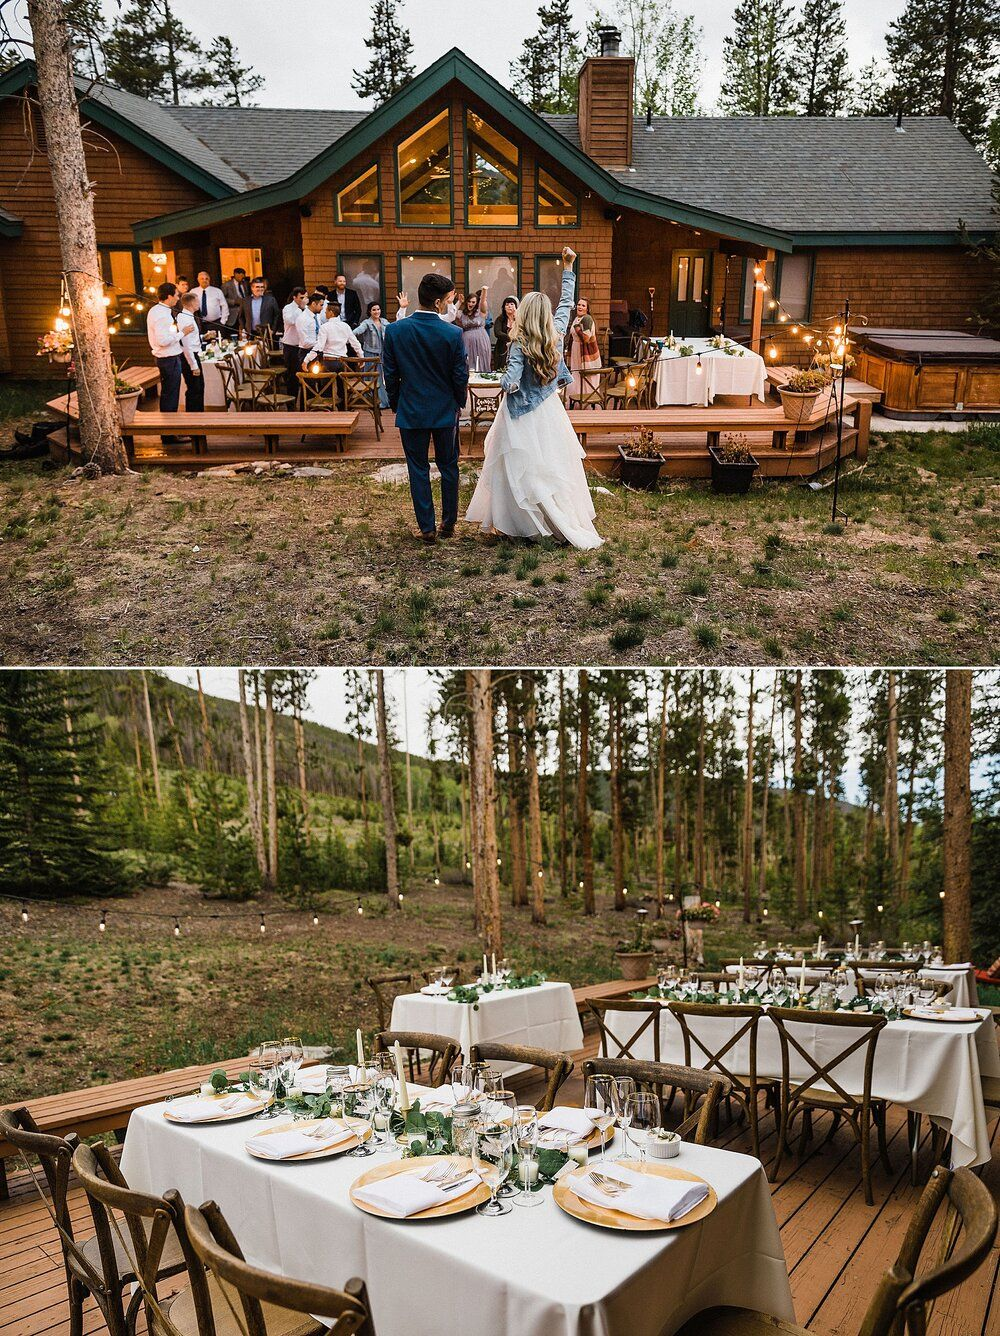 Ultimate Guide For Eloping In Breckenridge Colorado Mountain Wedding Colorado Colorado Wedding Colorado Wedding Venues